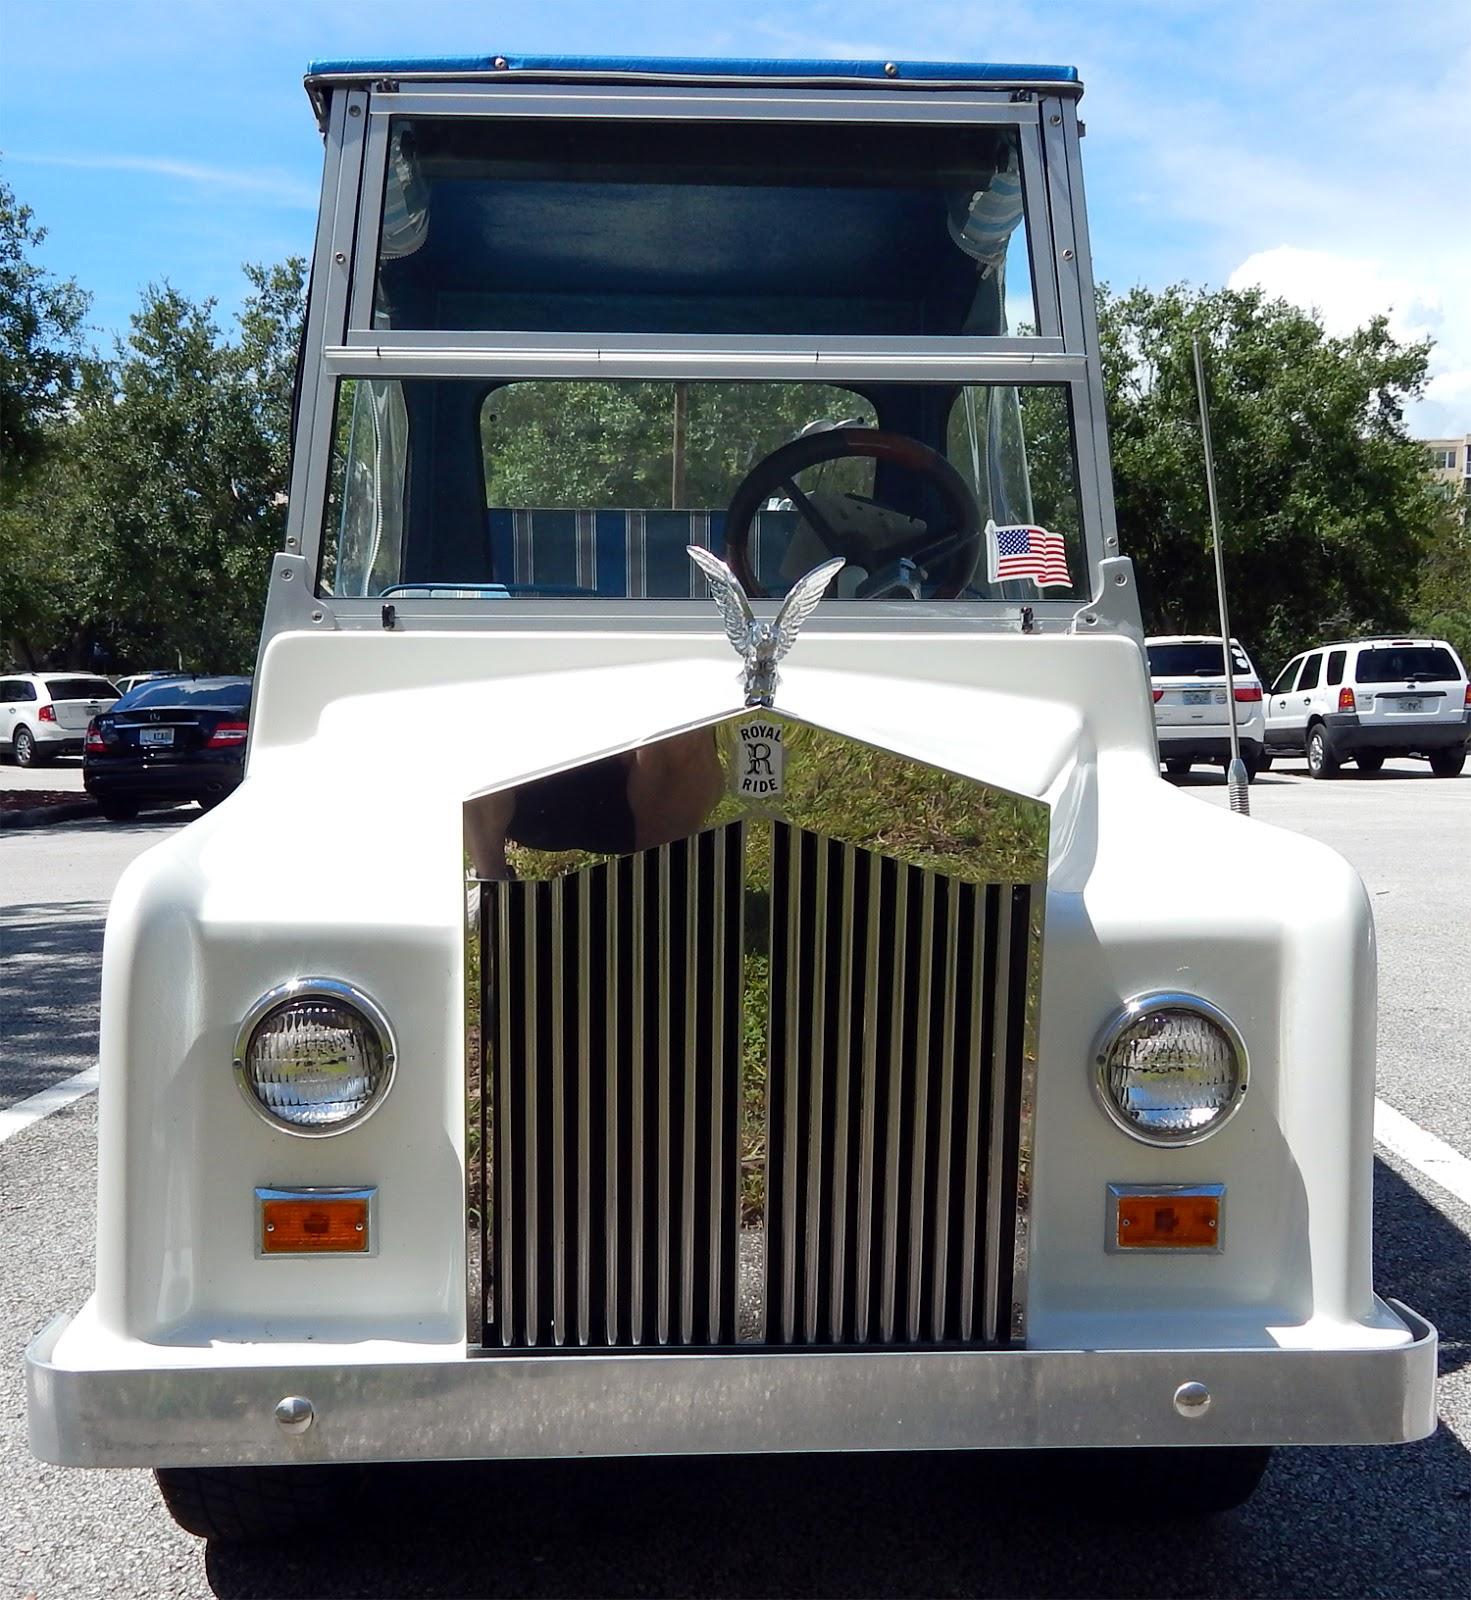 Rolls Royce Golf Cart >> Rolls Royce 'Royal Ride' golf cart with chrome grille, Sun City Center, FL